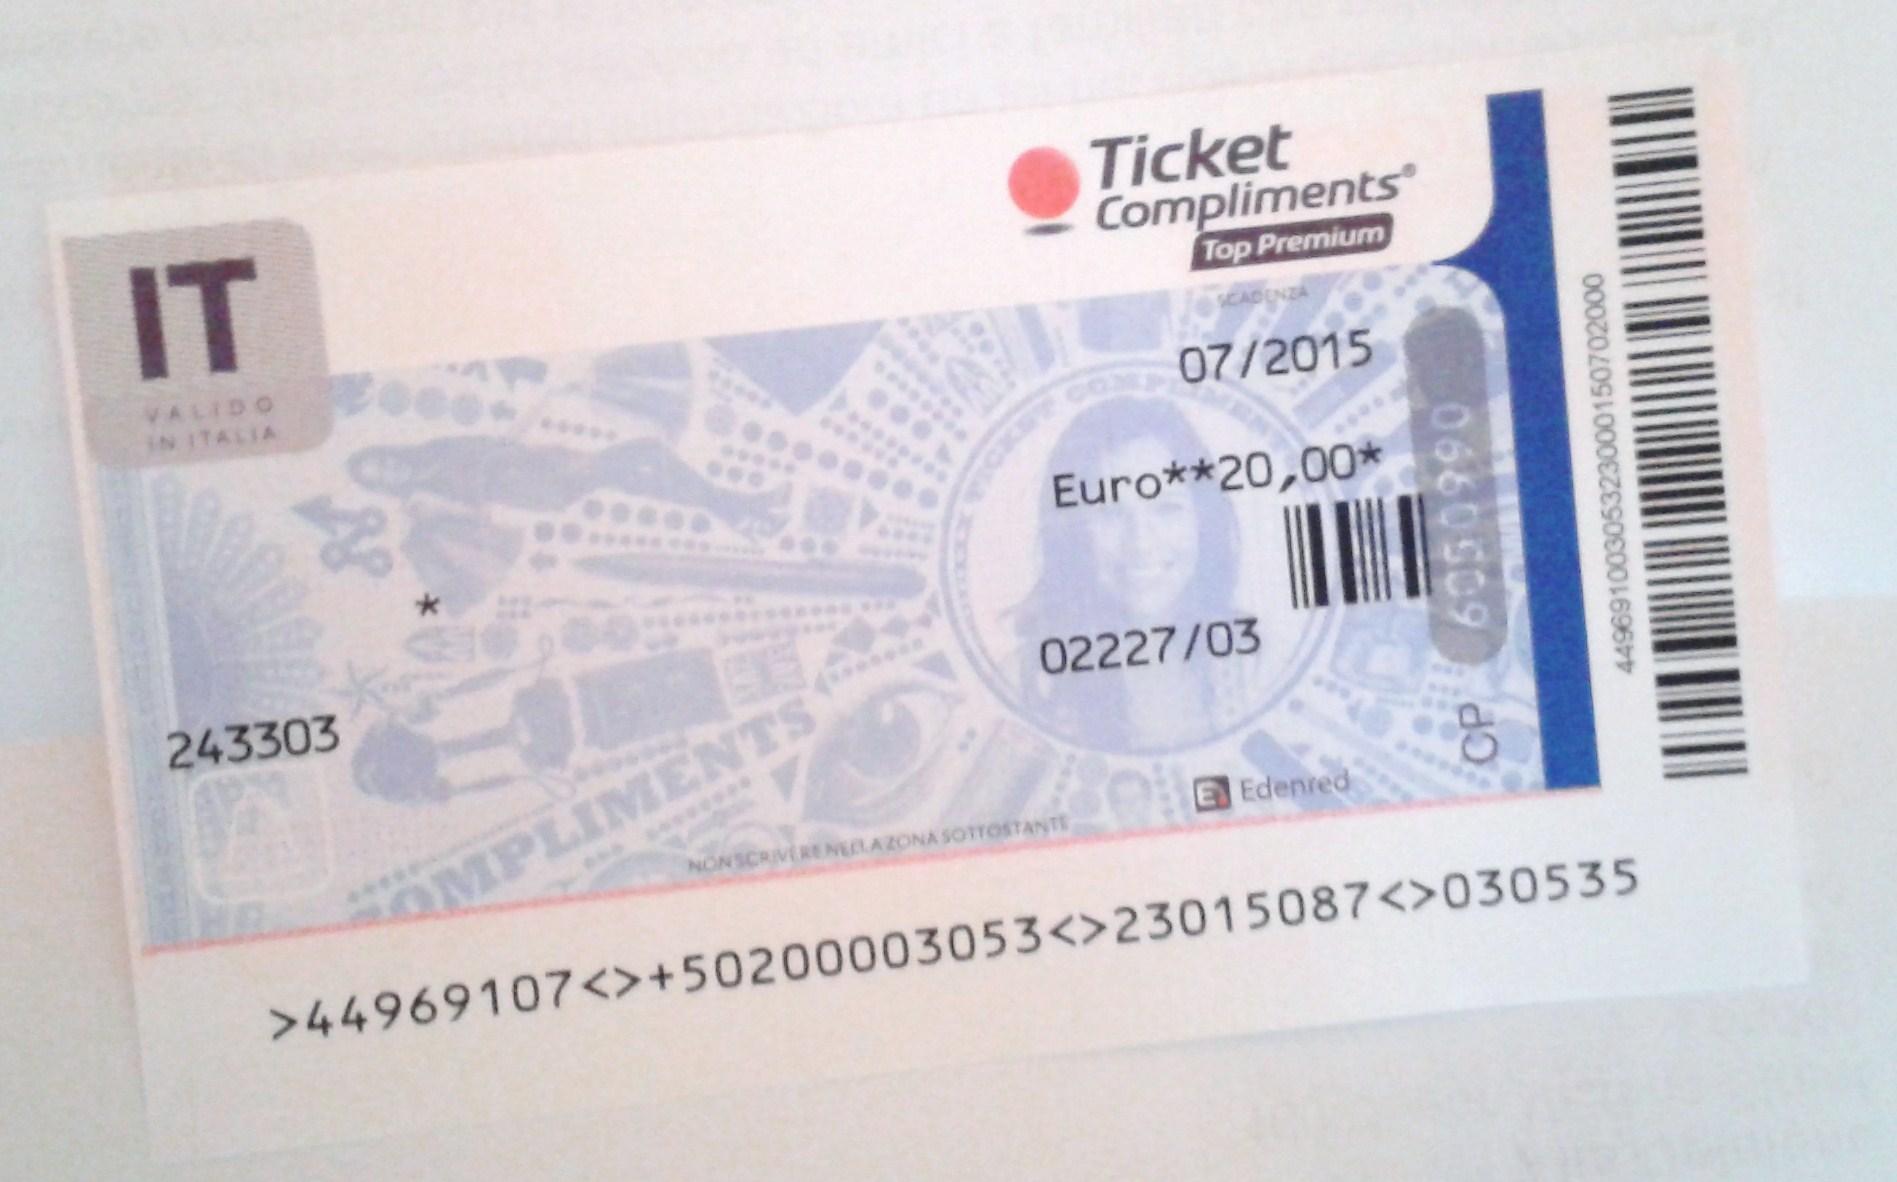 campioniomaggio.it_2014-11-07_22-16-02